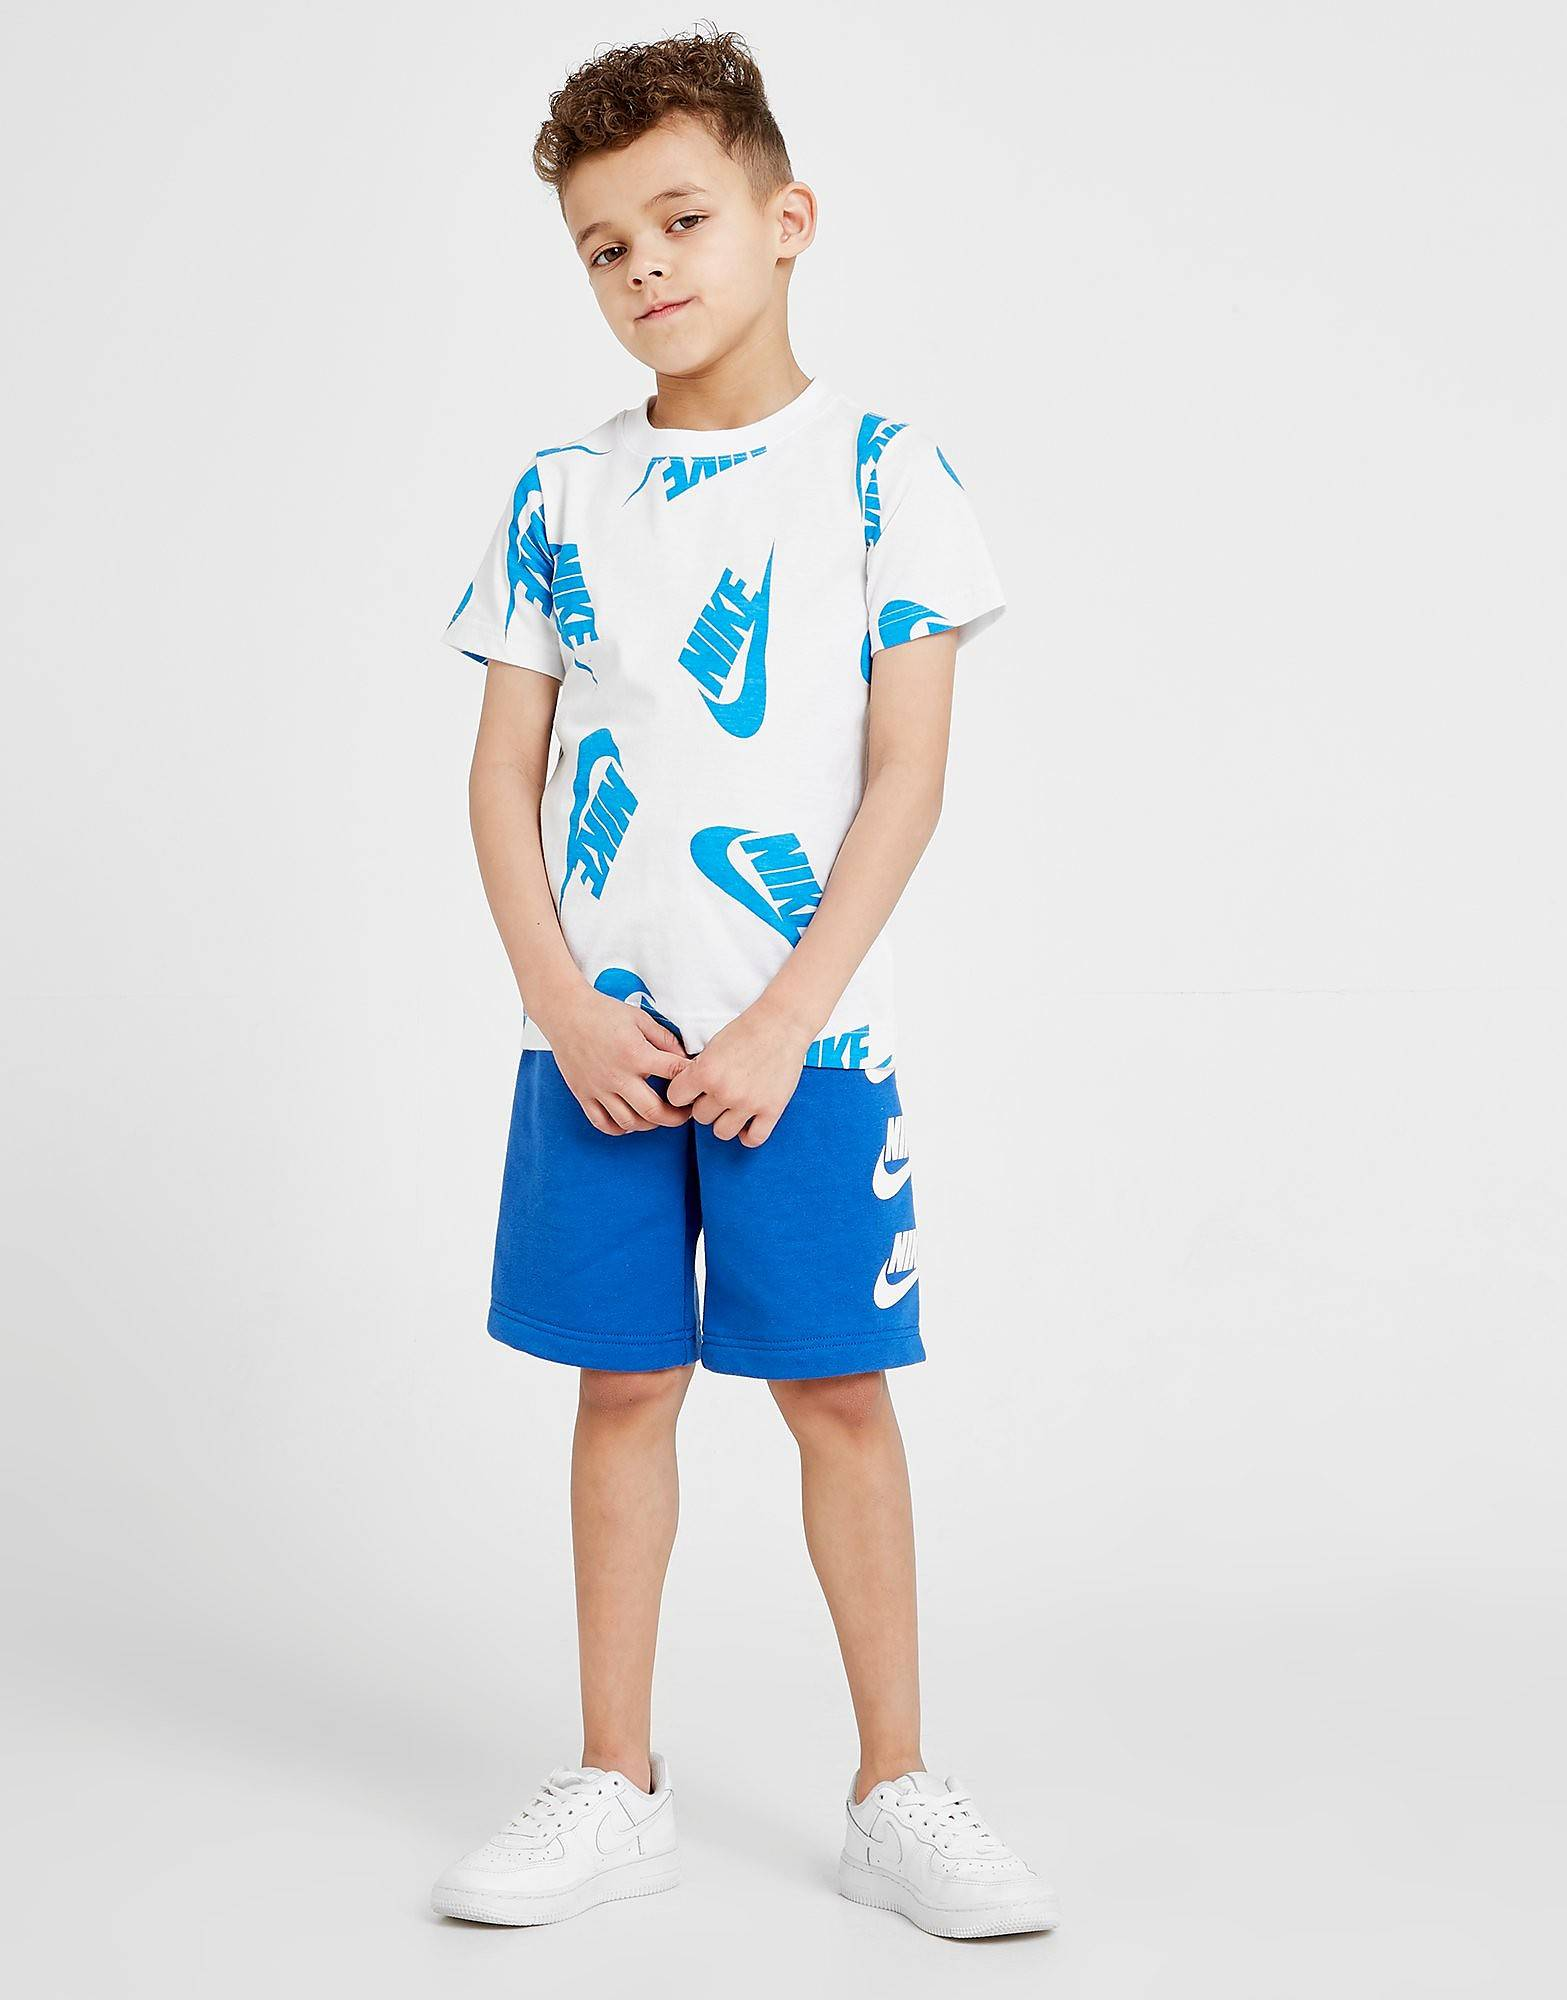 Image of Nike All Over Print T-Shirt/Shorts Set Children - Only at JD - Kids, Valkoinen